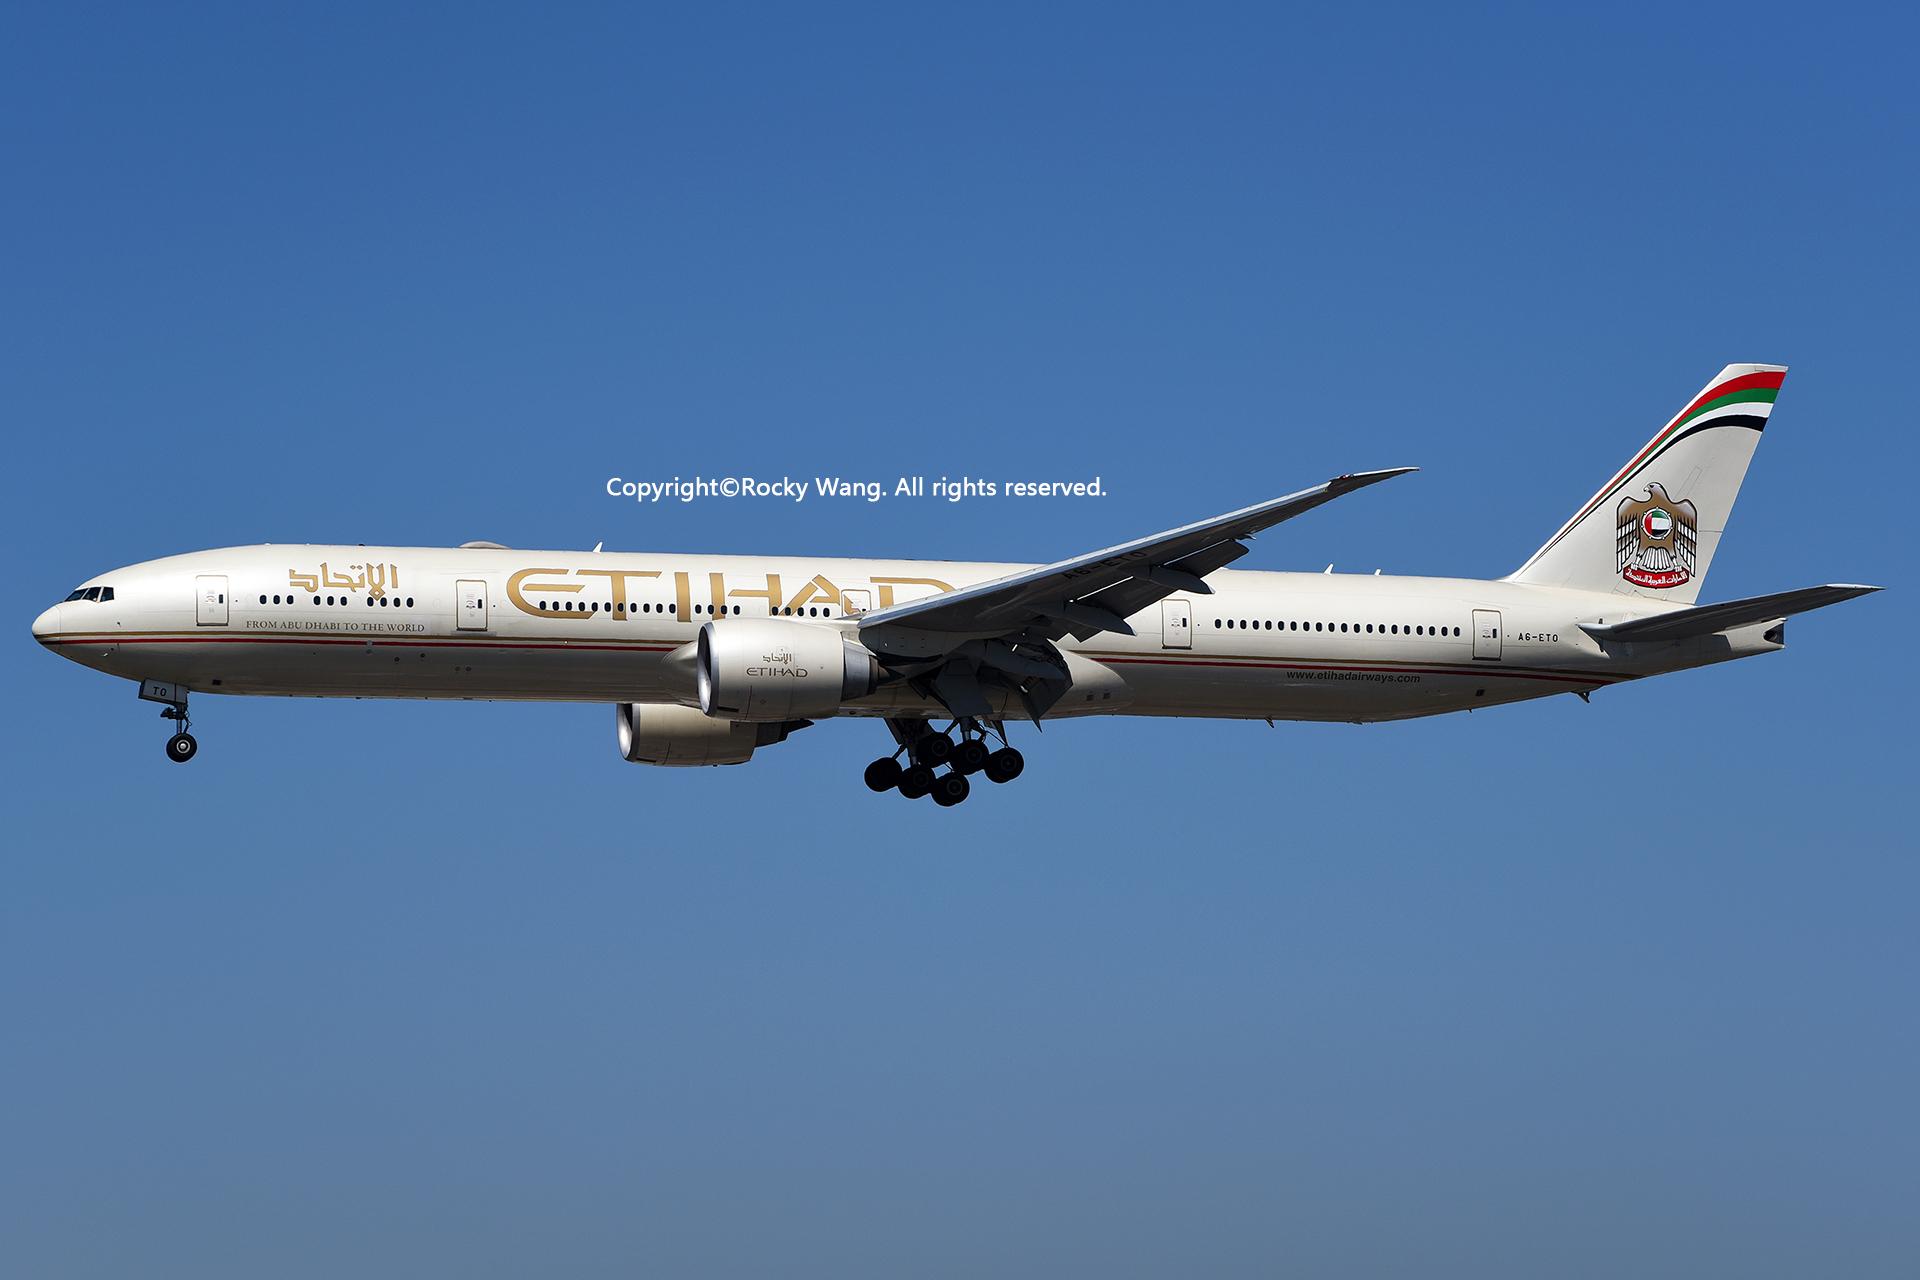 Re:[原创]居家了 批量处理老图 倾情奉献52家777 BOEING 777-3FXER A6-ETO Los Angeles Int'l Airport